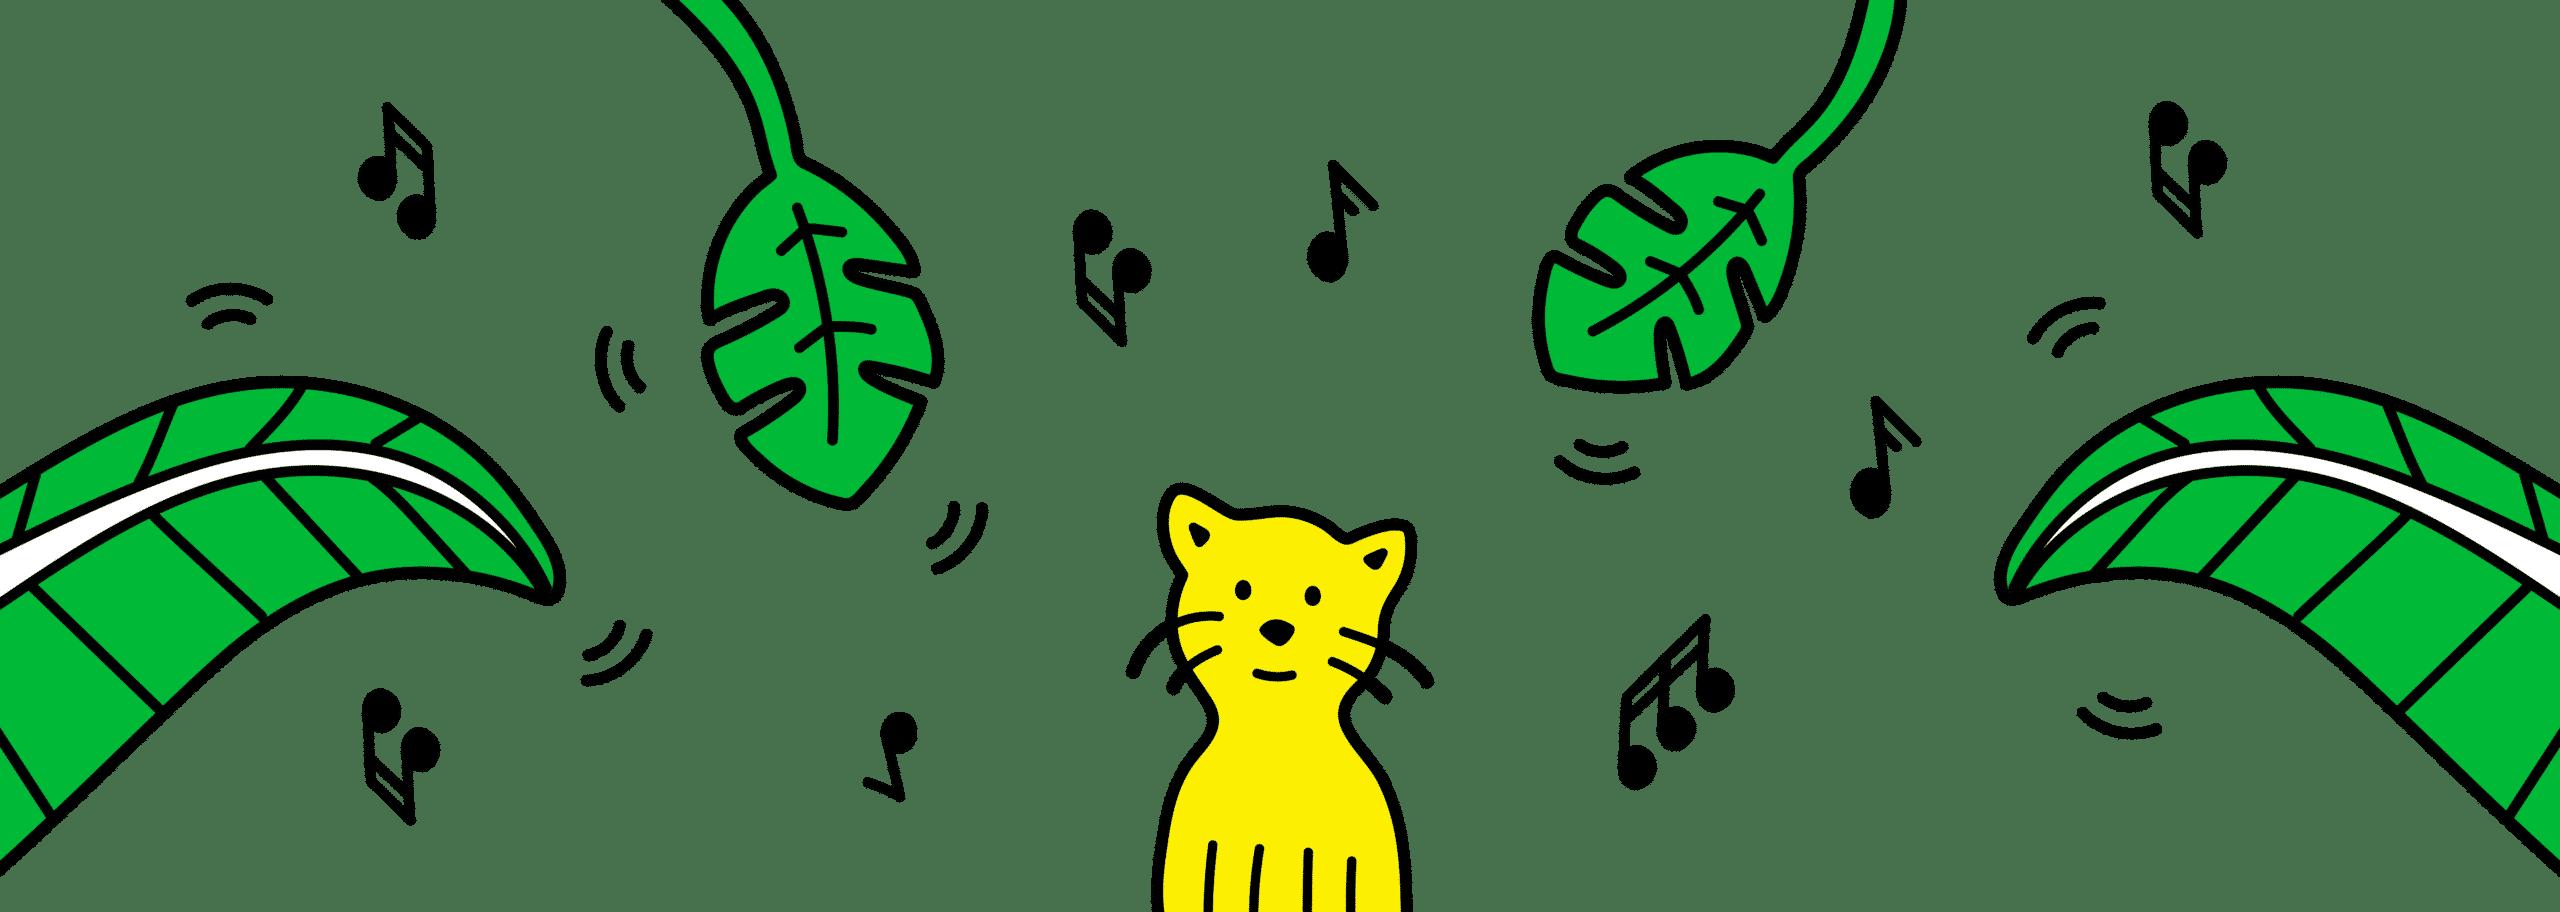 cat_plants_illustration